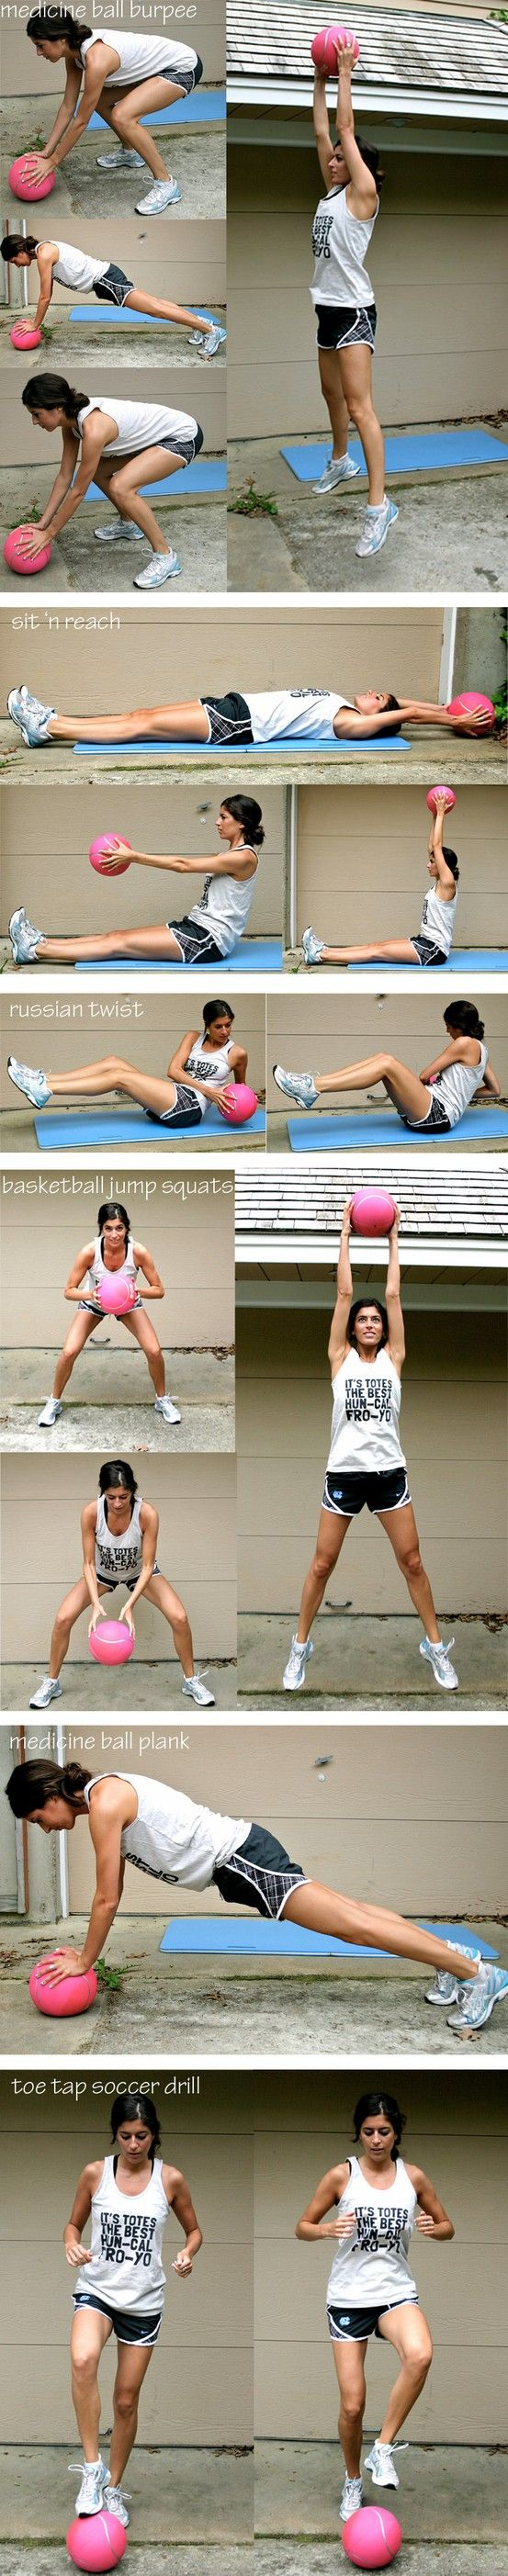 Medicine Ball Exercises: Russian Twist, Interval Workouts, Full Body, Work Outs, Medicine Ball Workouts, Exercise, Healthy, Med Ball, Ball Interval